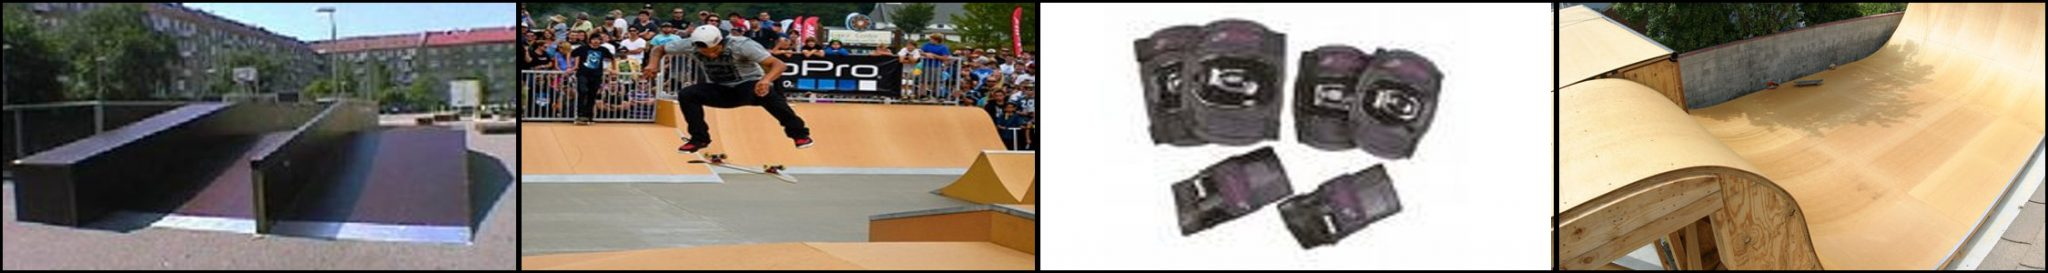 skateboard reservedele